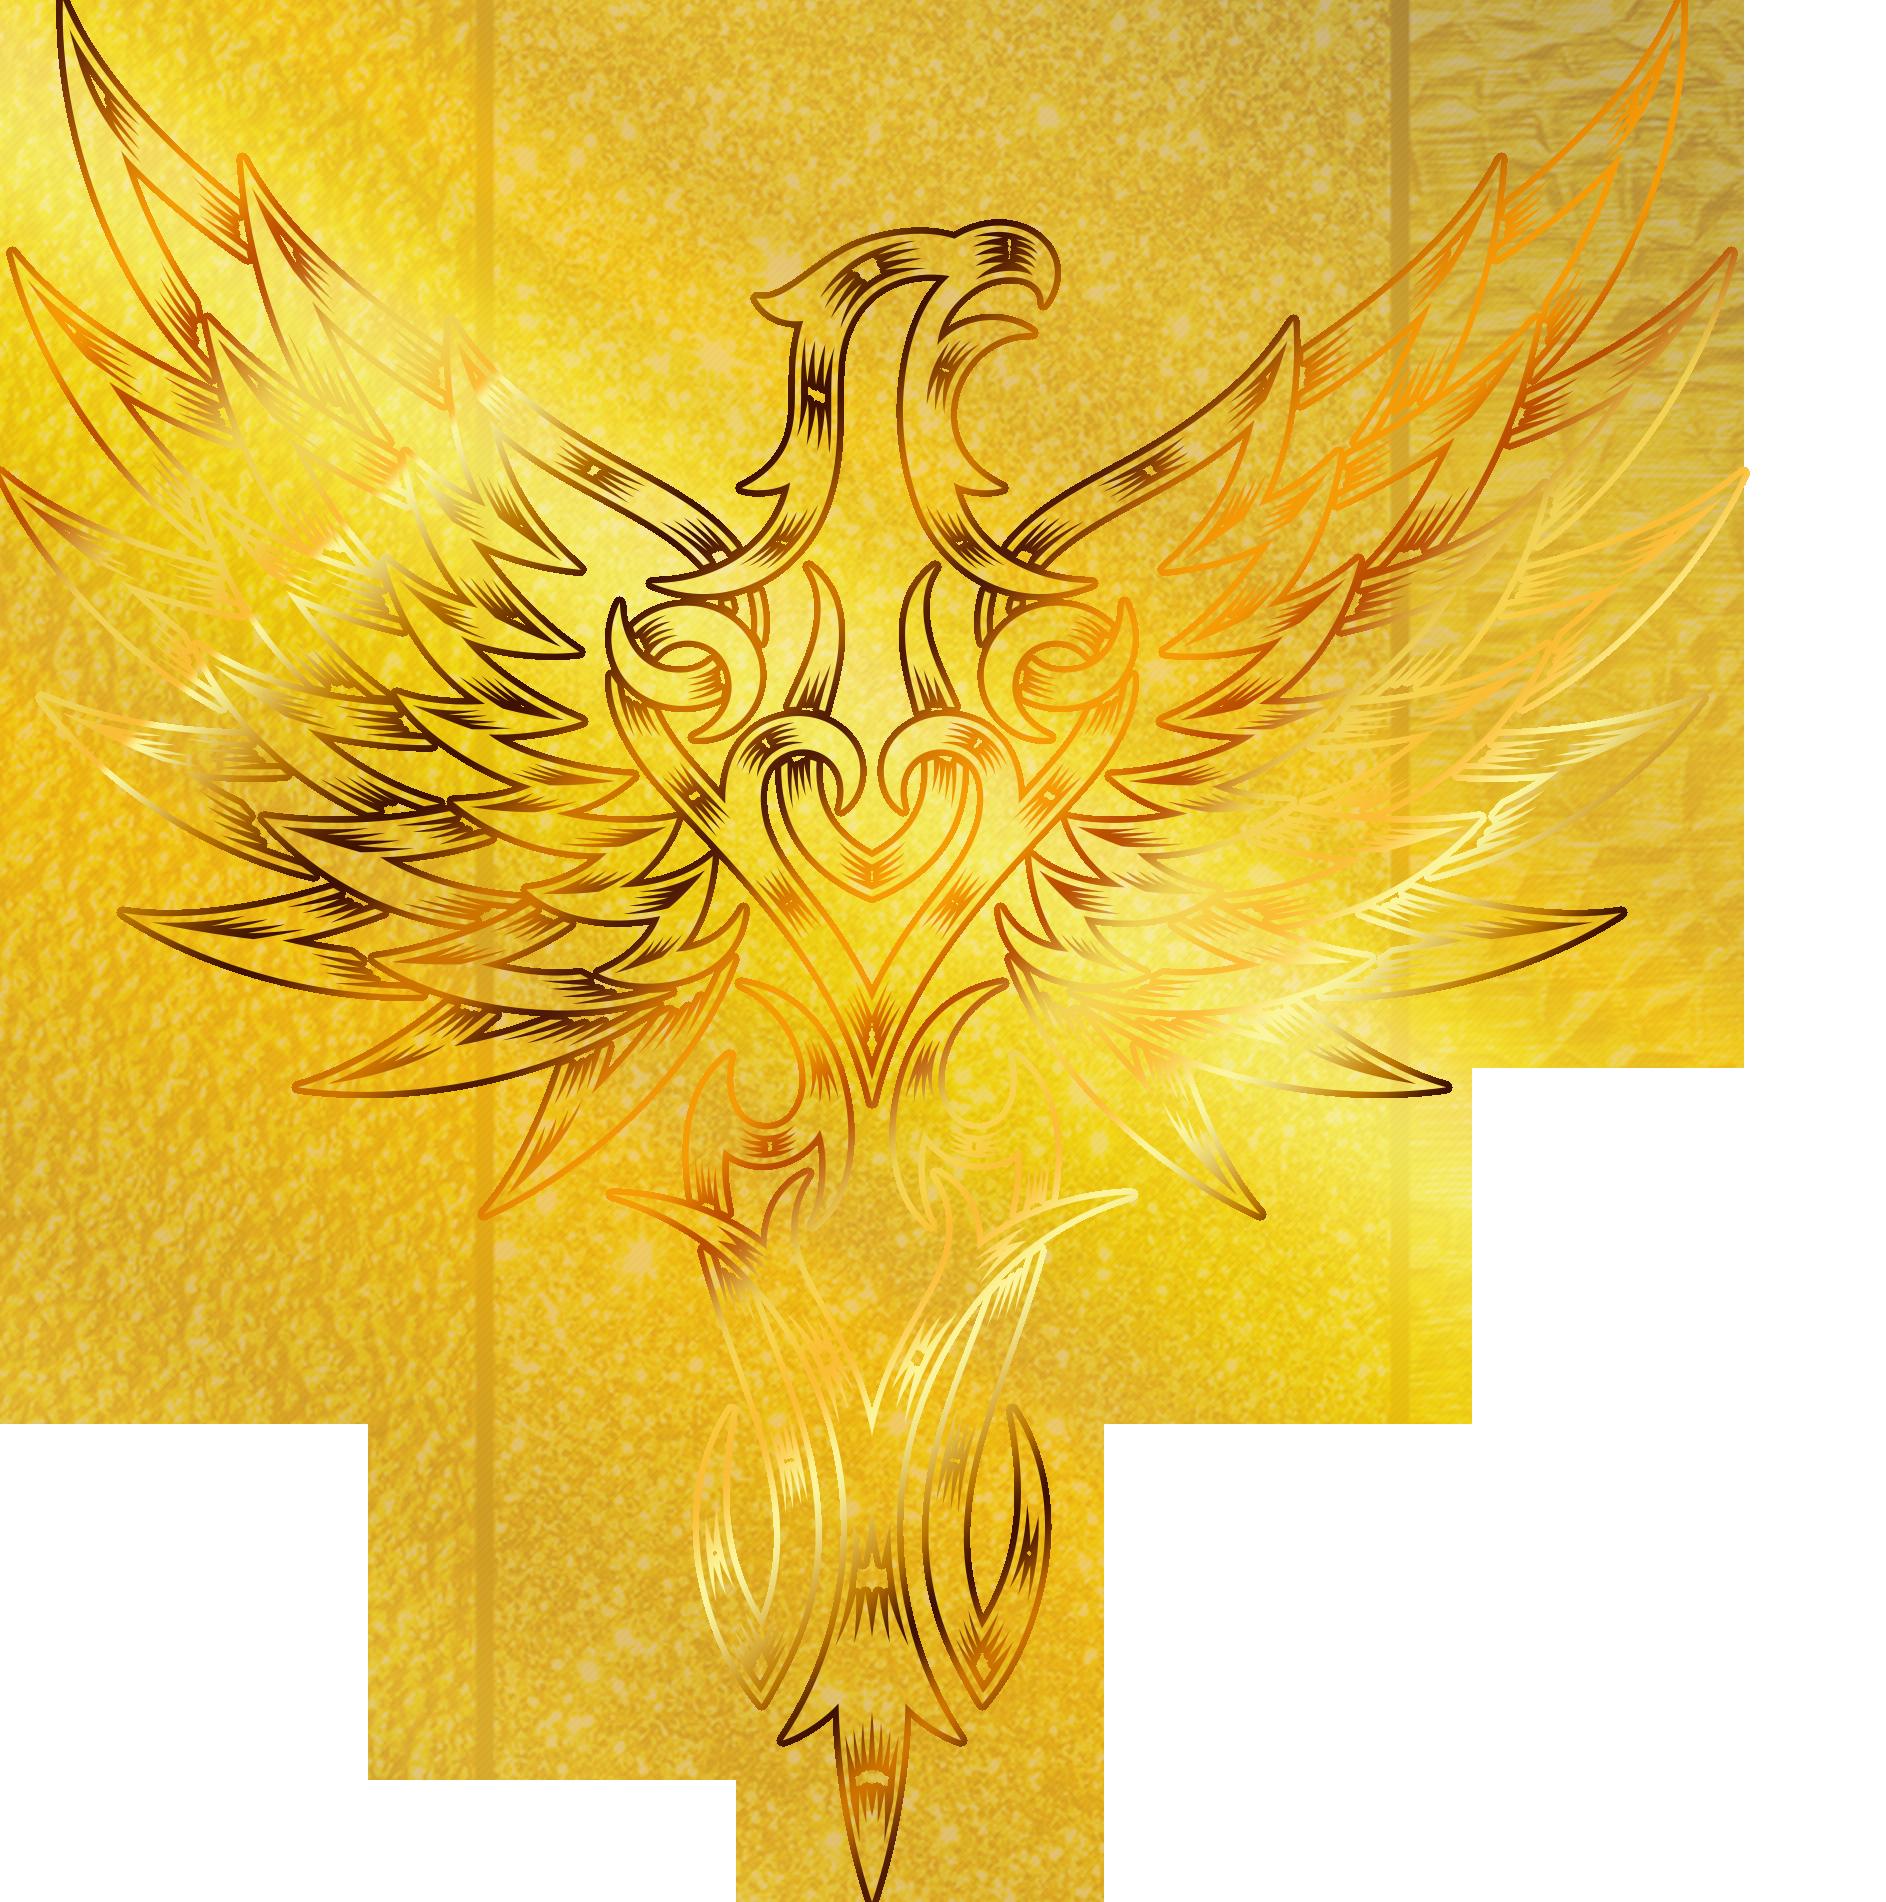 Wing clipart supernatural, Wing supernatural Transparent